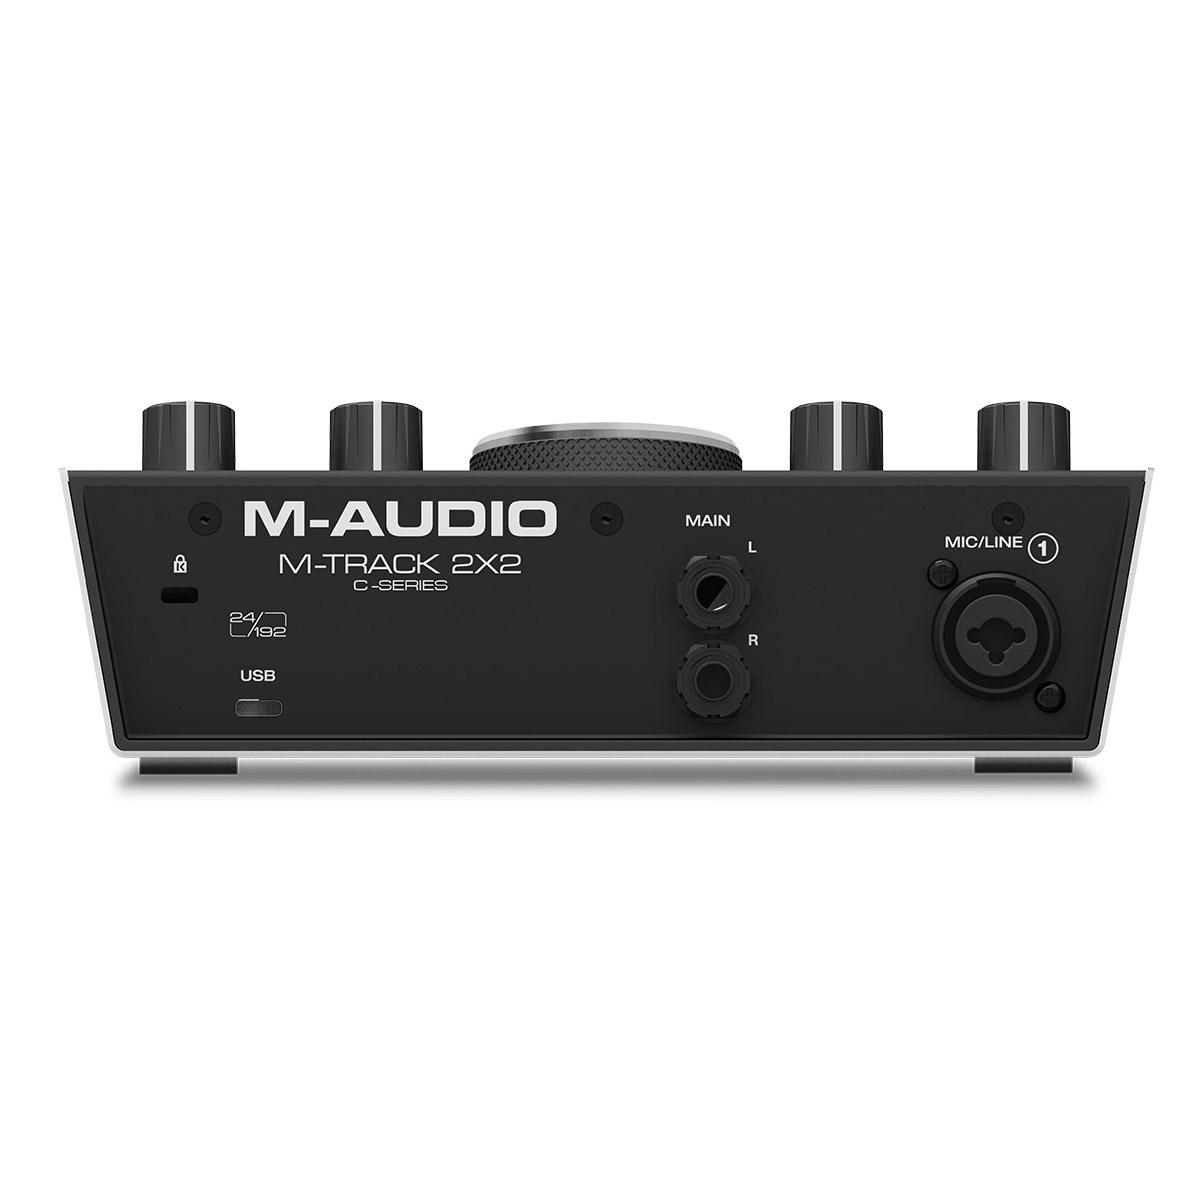 M-AUDIO M-TRACK 2x2 オーディオインターフェイス 【Mオーディオ】 【梅田ロフト店】 画像二